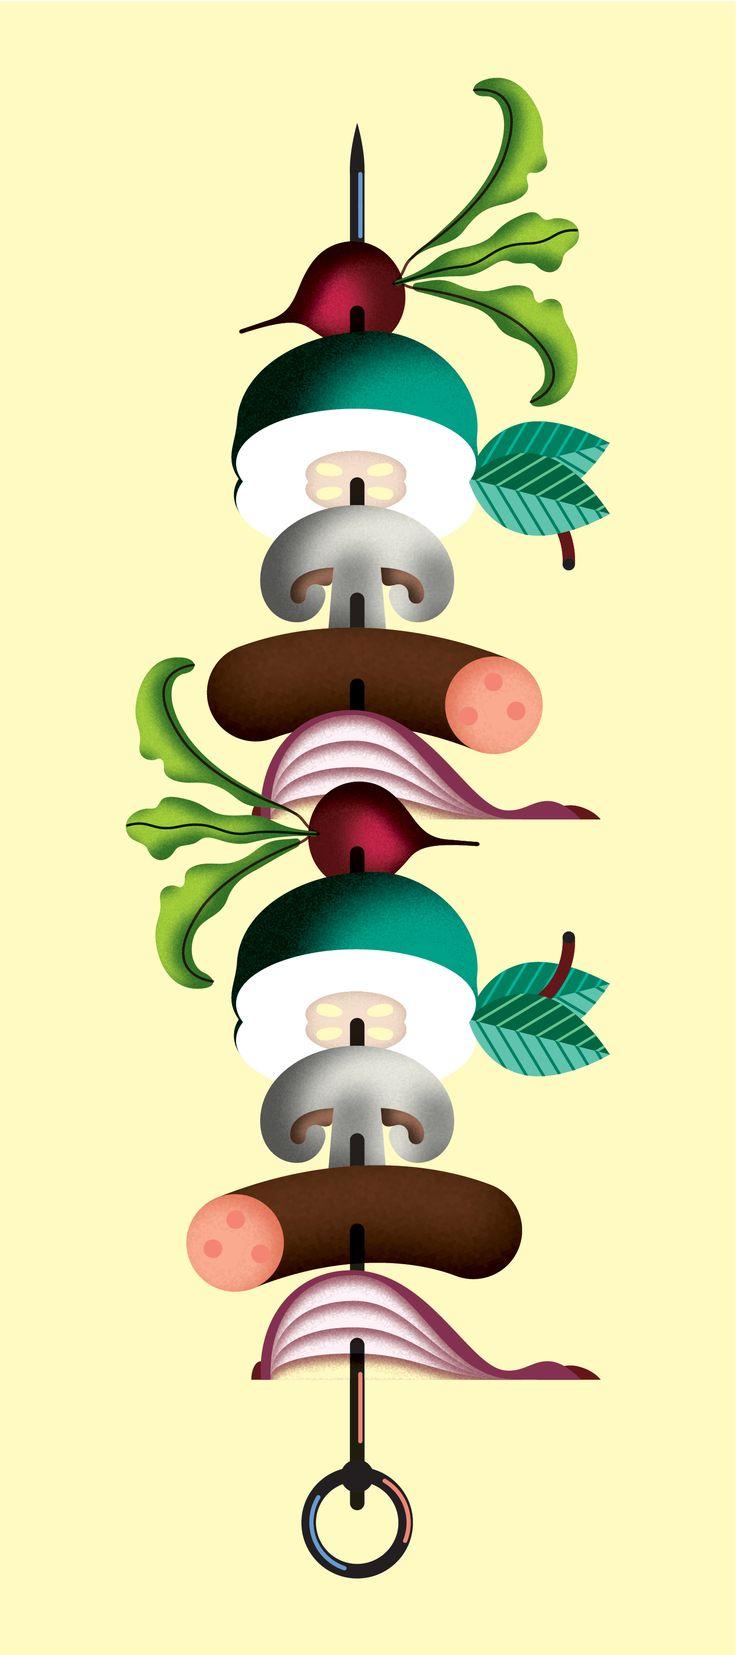 Barbecue. By Studio Kalle Mattsson.